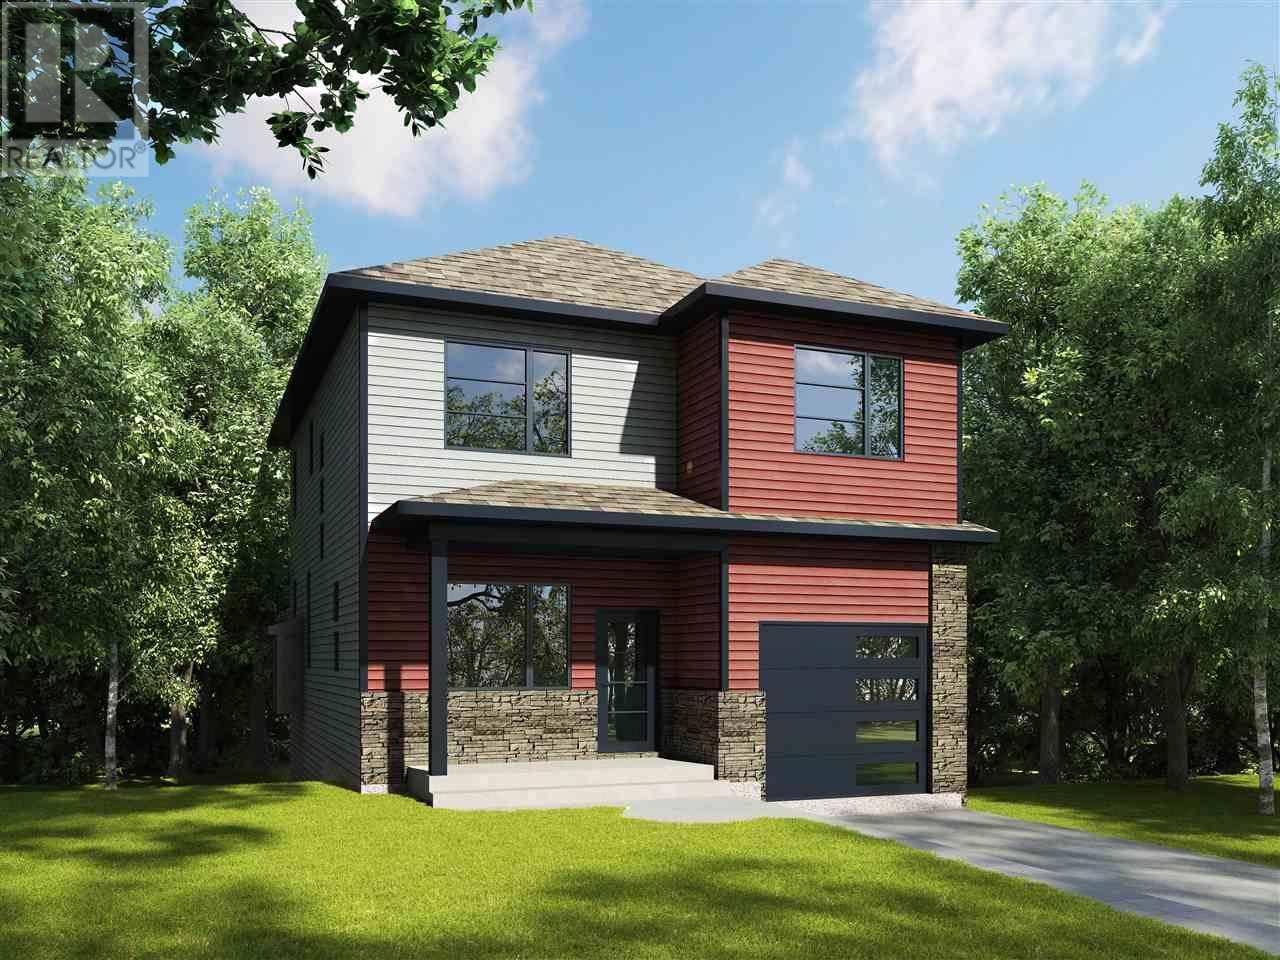 House for sale at 255 Maple Grove Ave Unit 4 Timberlea Nova Scotia - MLS: 201925165